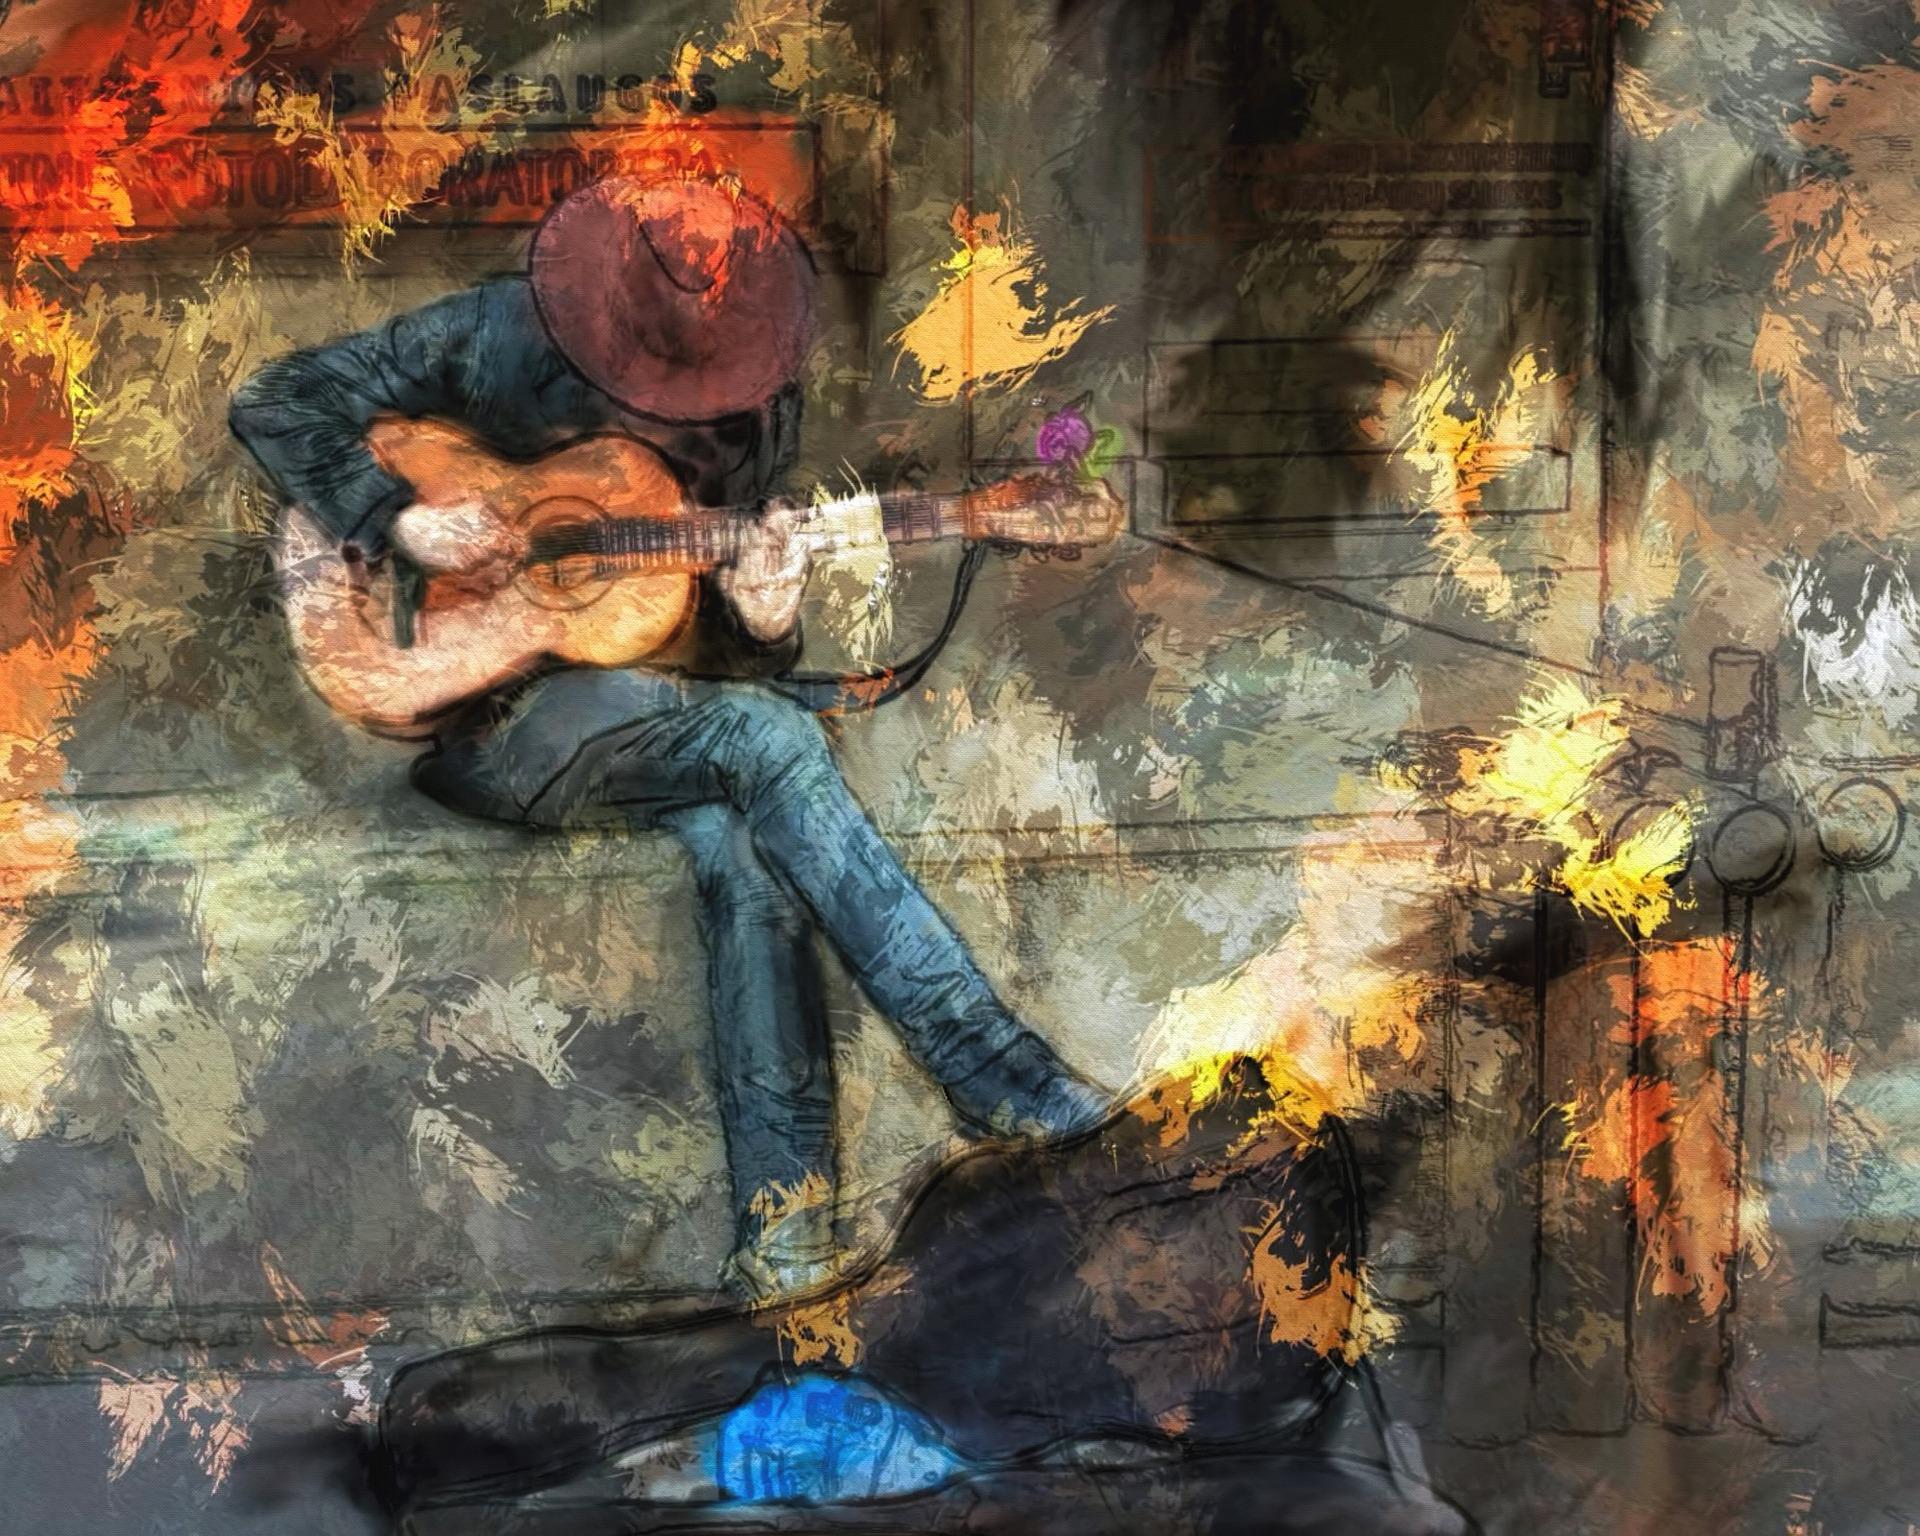 music-863568_1920.jpg